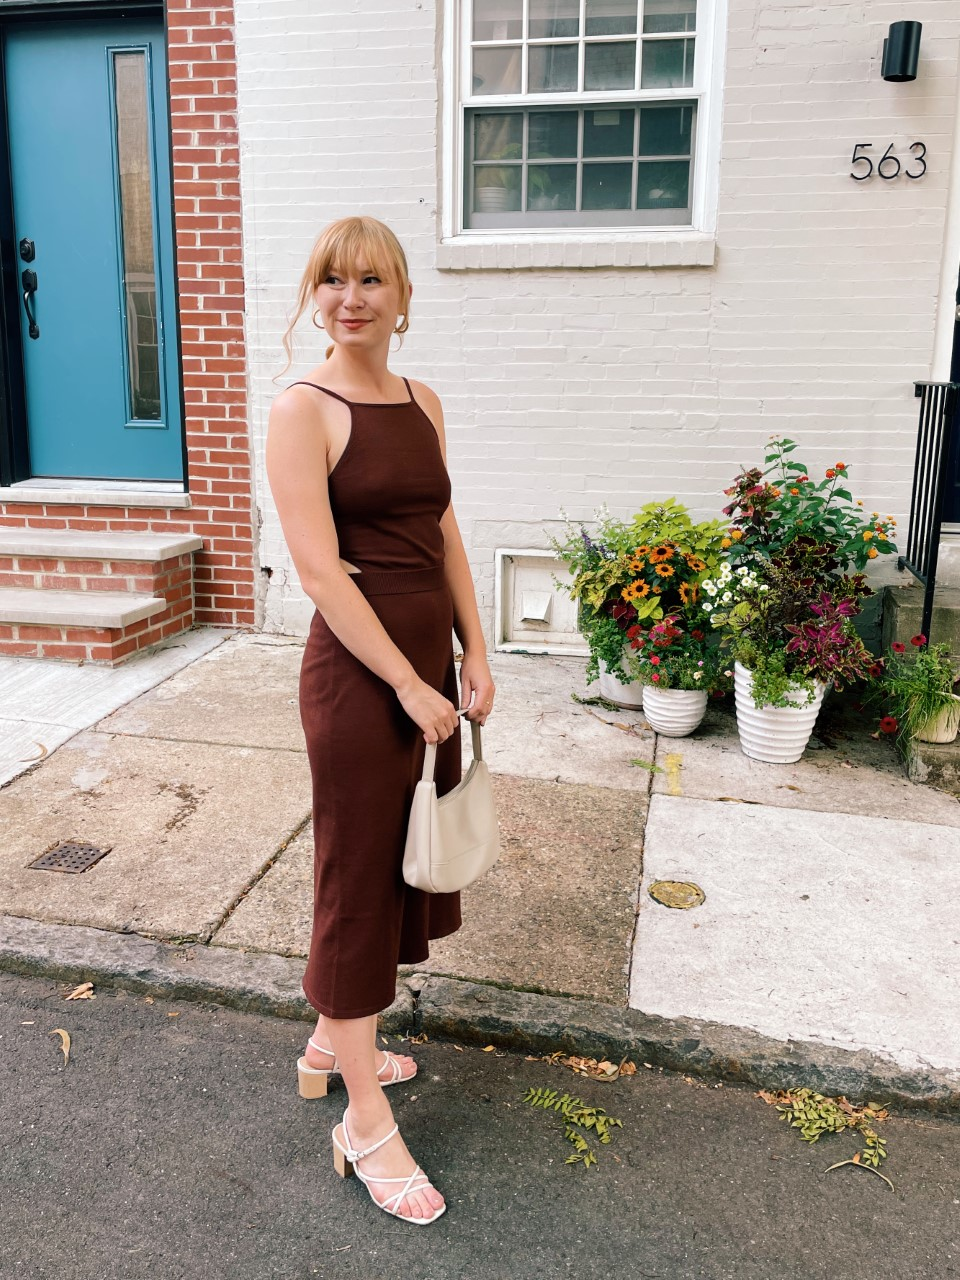 Styling a Knit Midi Dress for Date Night   Organized Mess